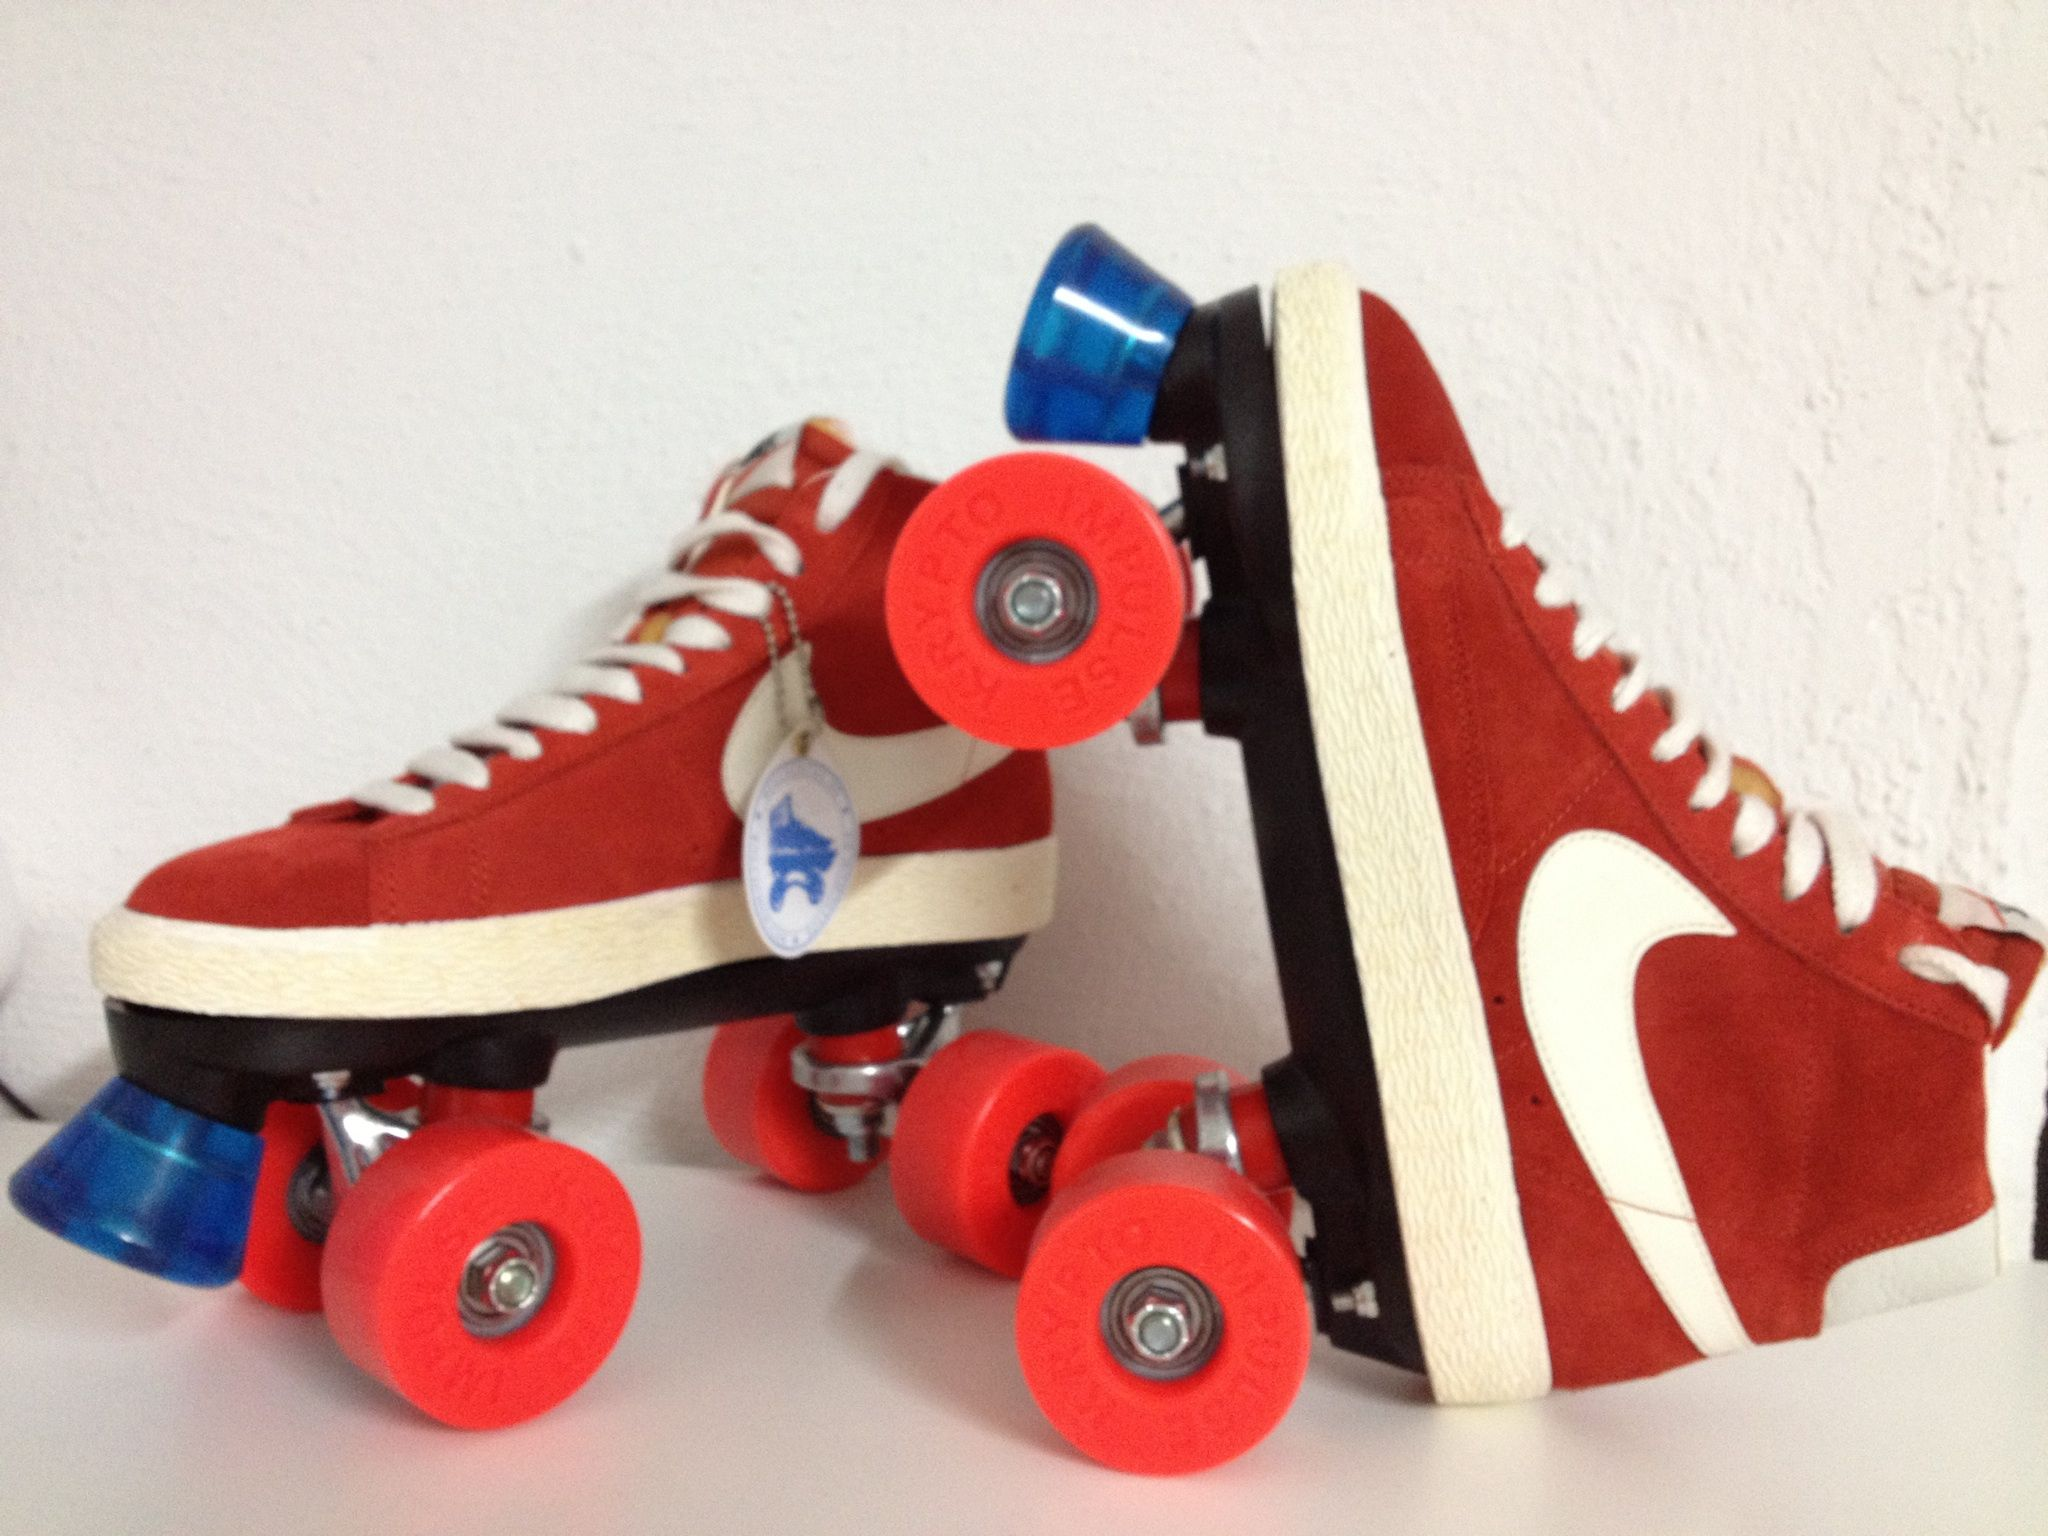 Nike Blazer Krypto Impulse 62mm Formula2 Made By Rollschuhe De Quad Skates Roller Skating Fun Sports